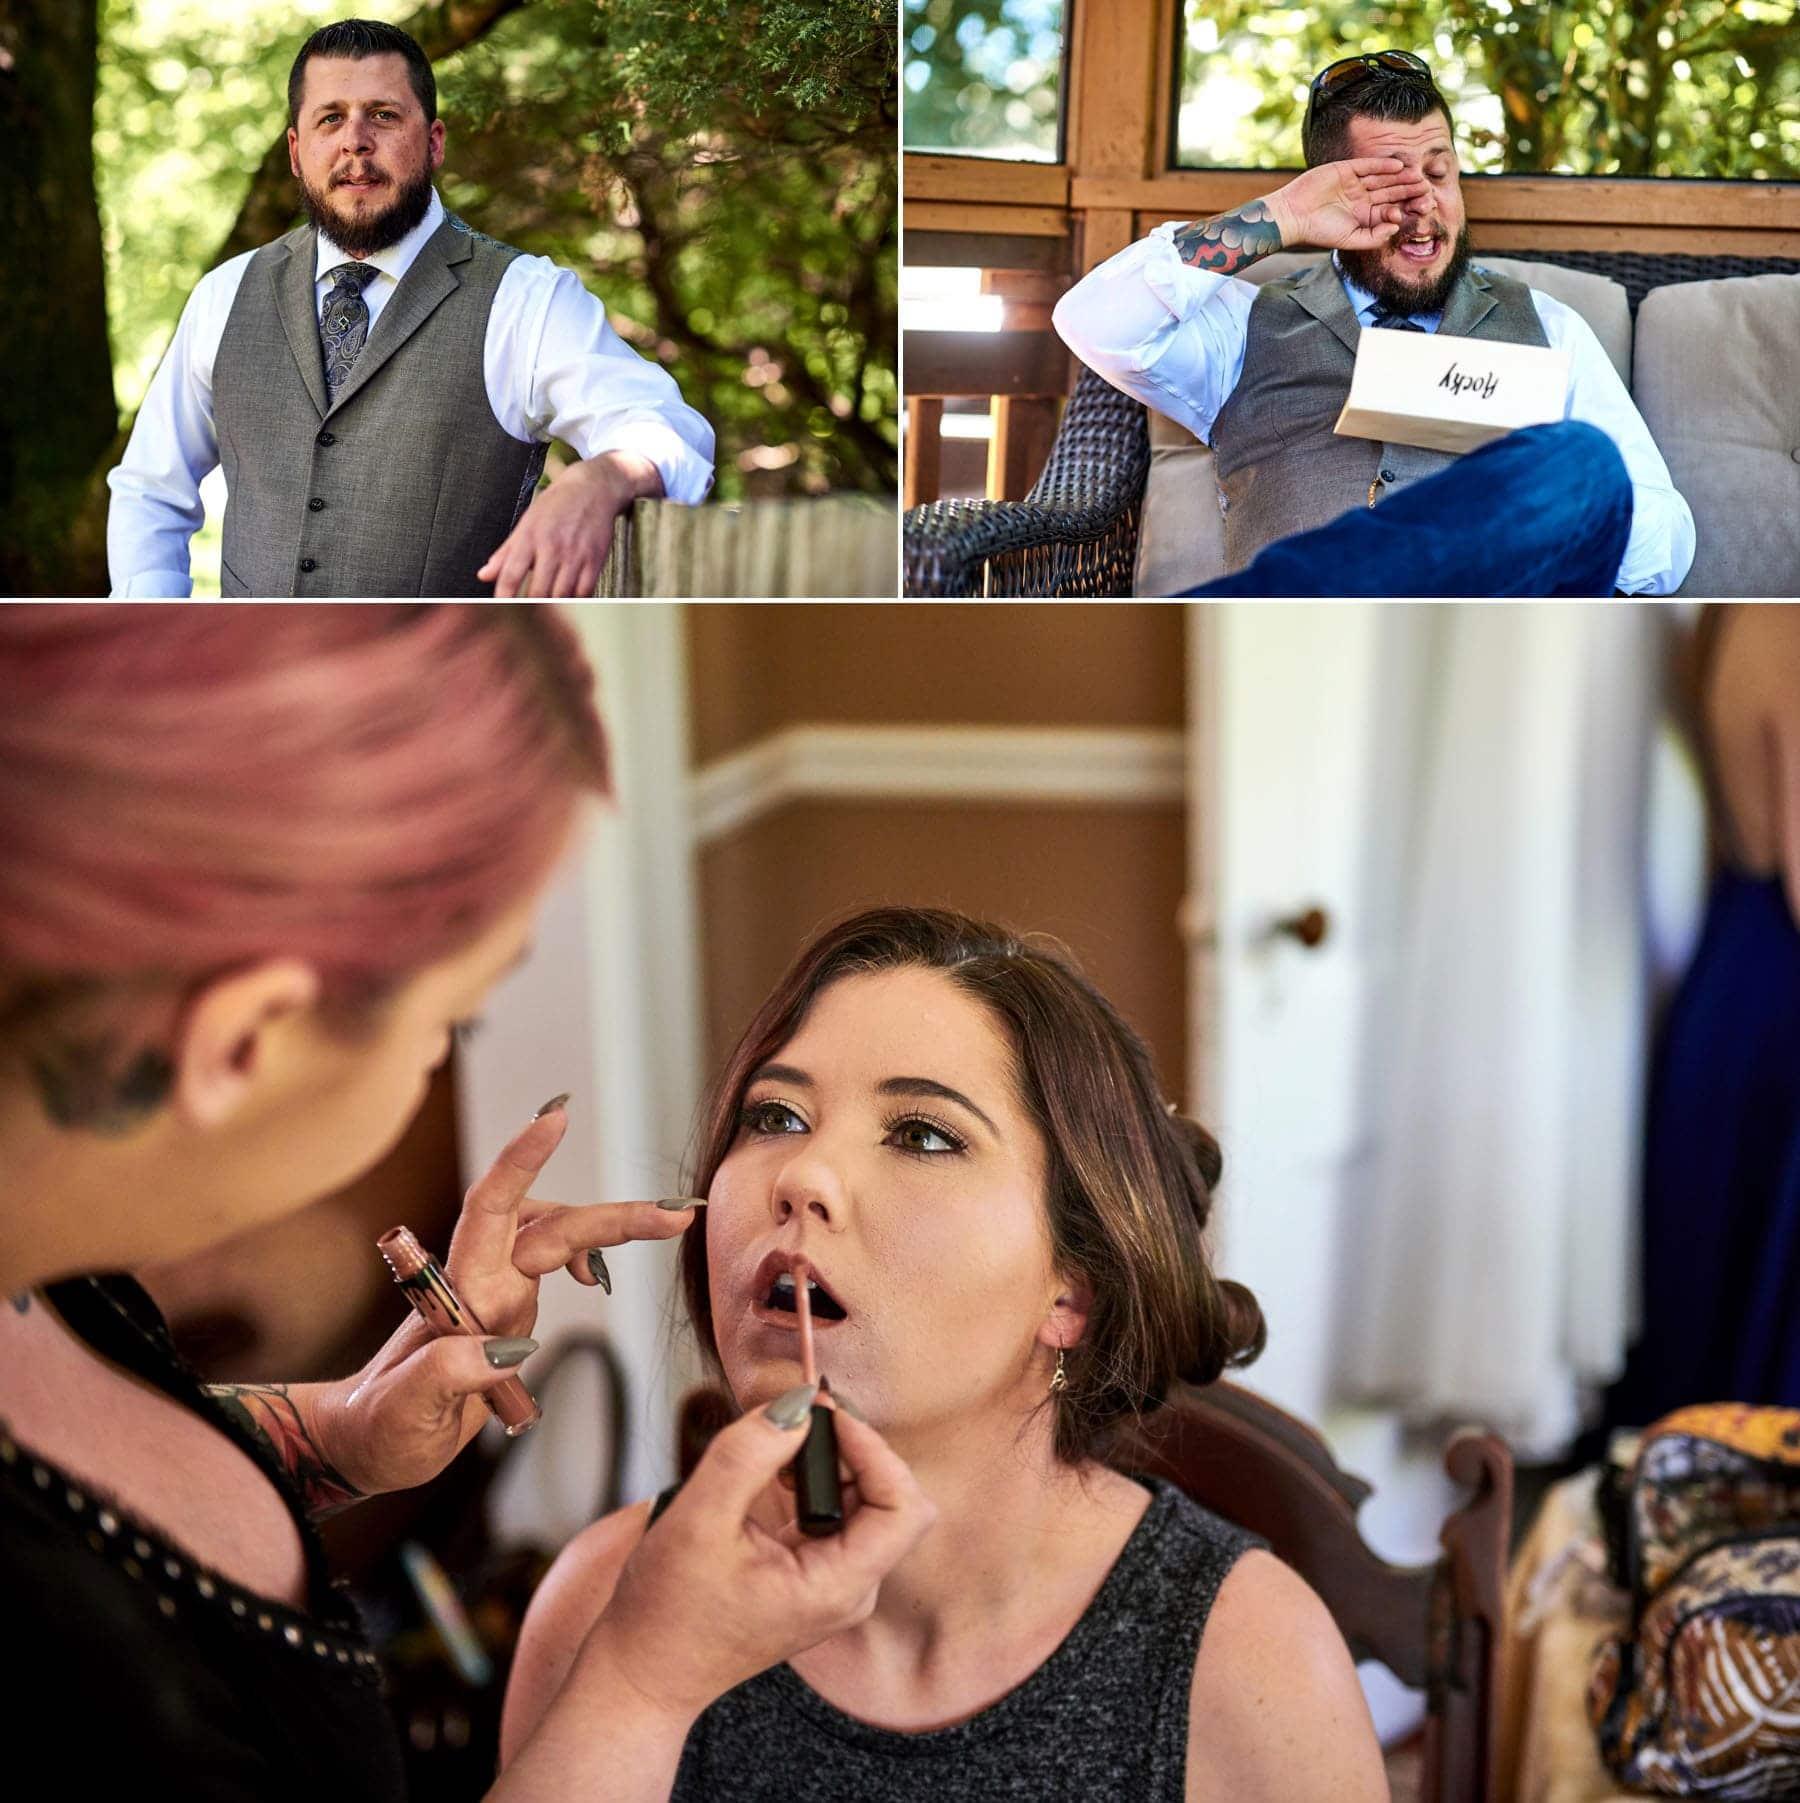 bride and groom getting ready photos for farm wedding